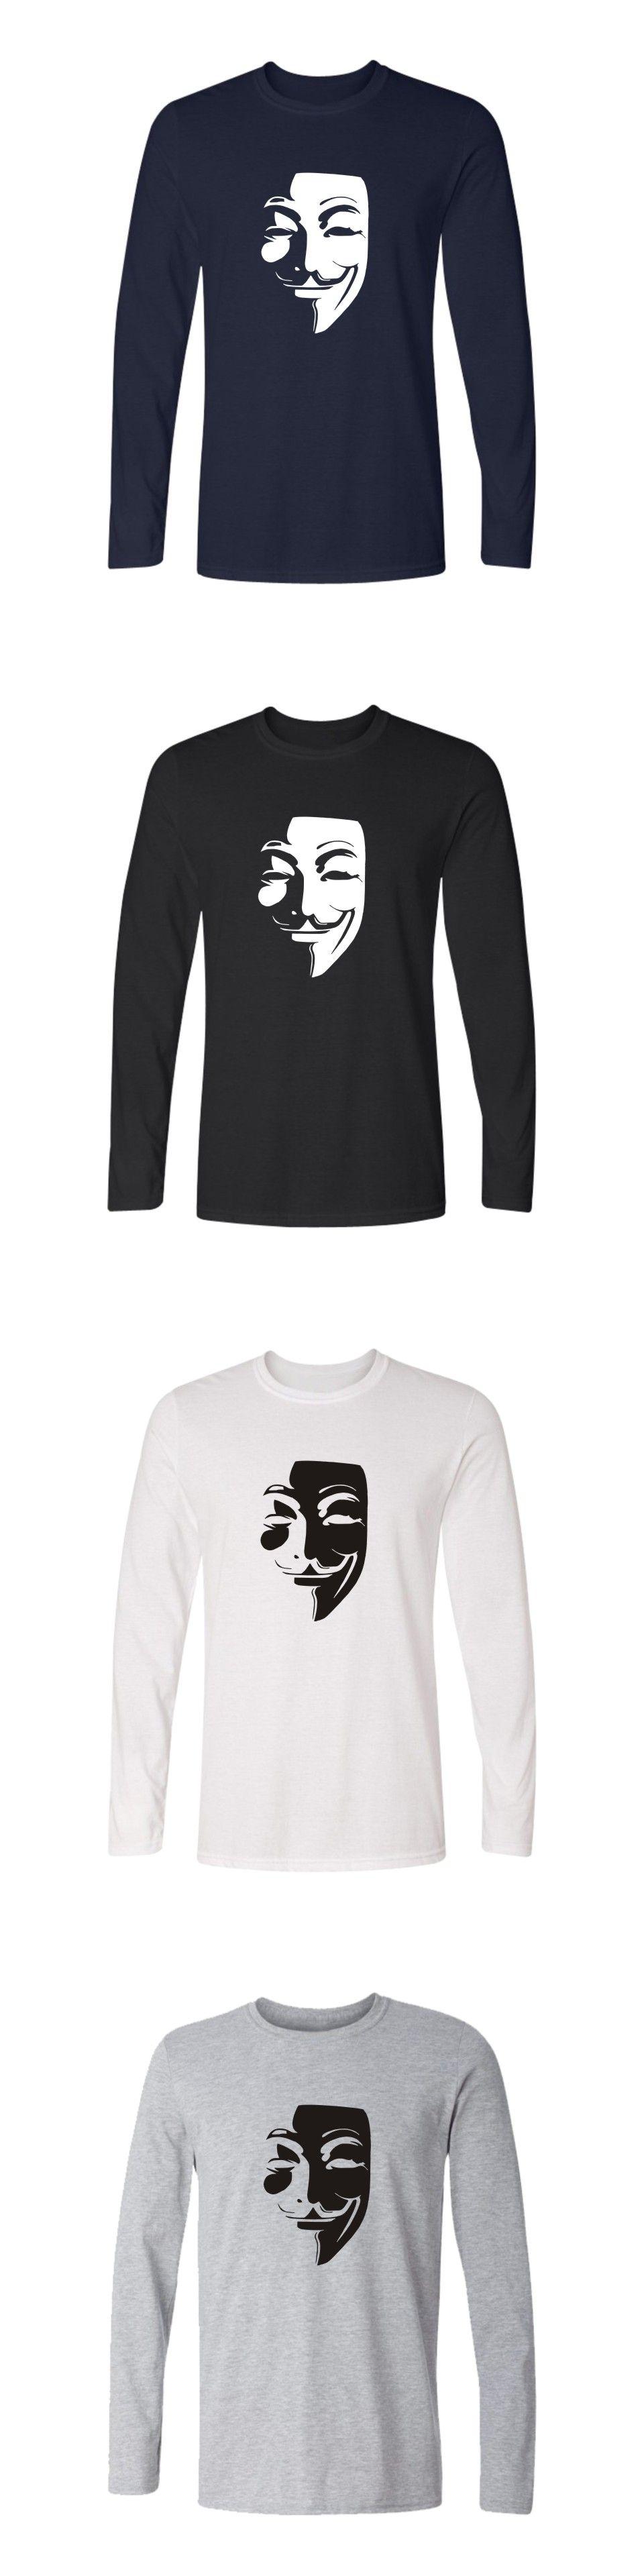 896478c48a471 V for Vendetta Long Sleeve Tee Shirt Men Autumn Fashion Casual Cotton  T-shirt Women Spring Funny T Shirts For Men Plus Size 4XL